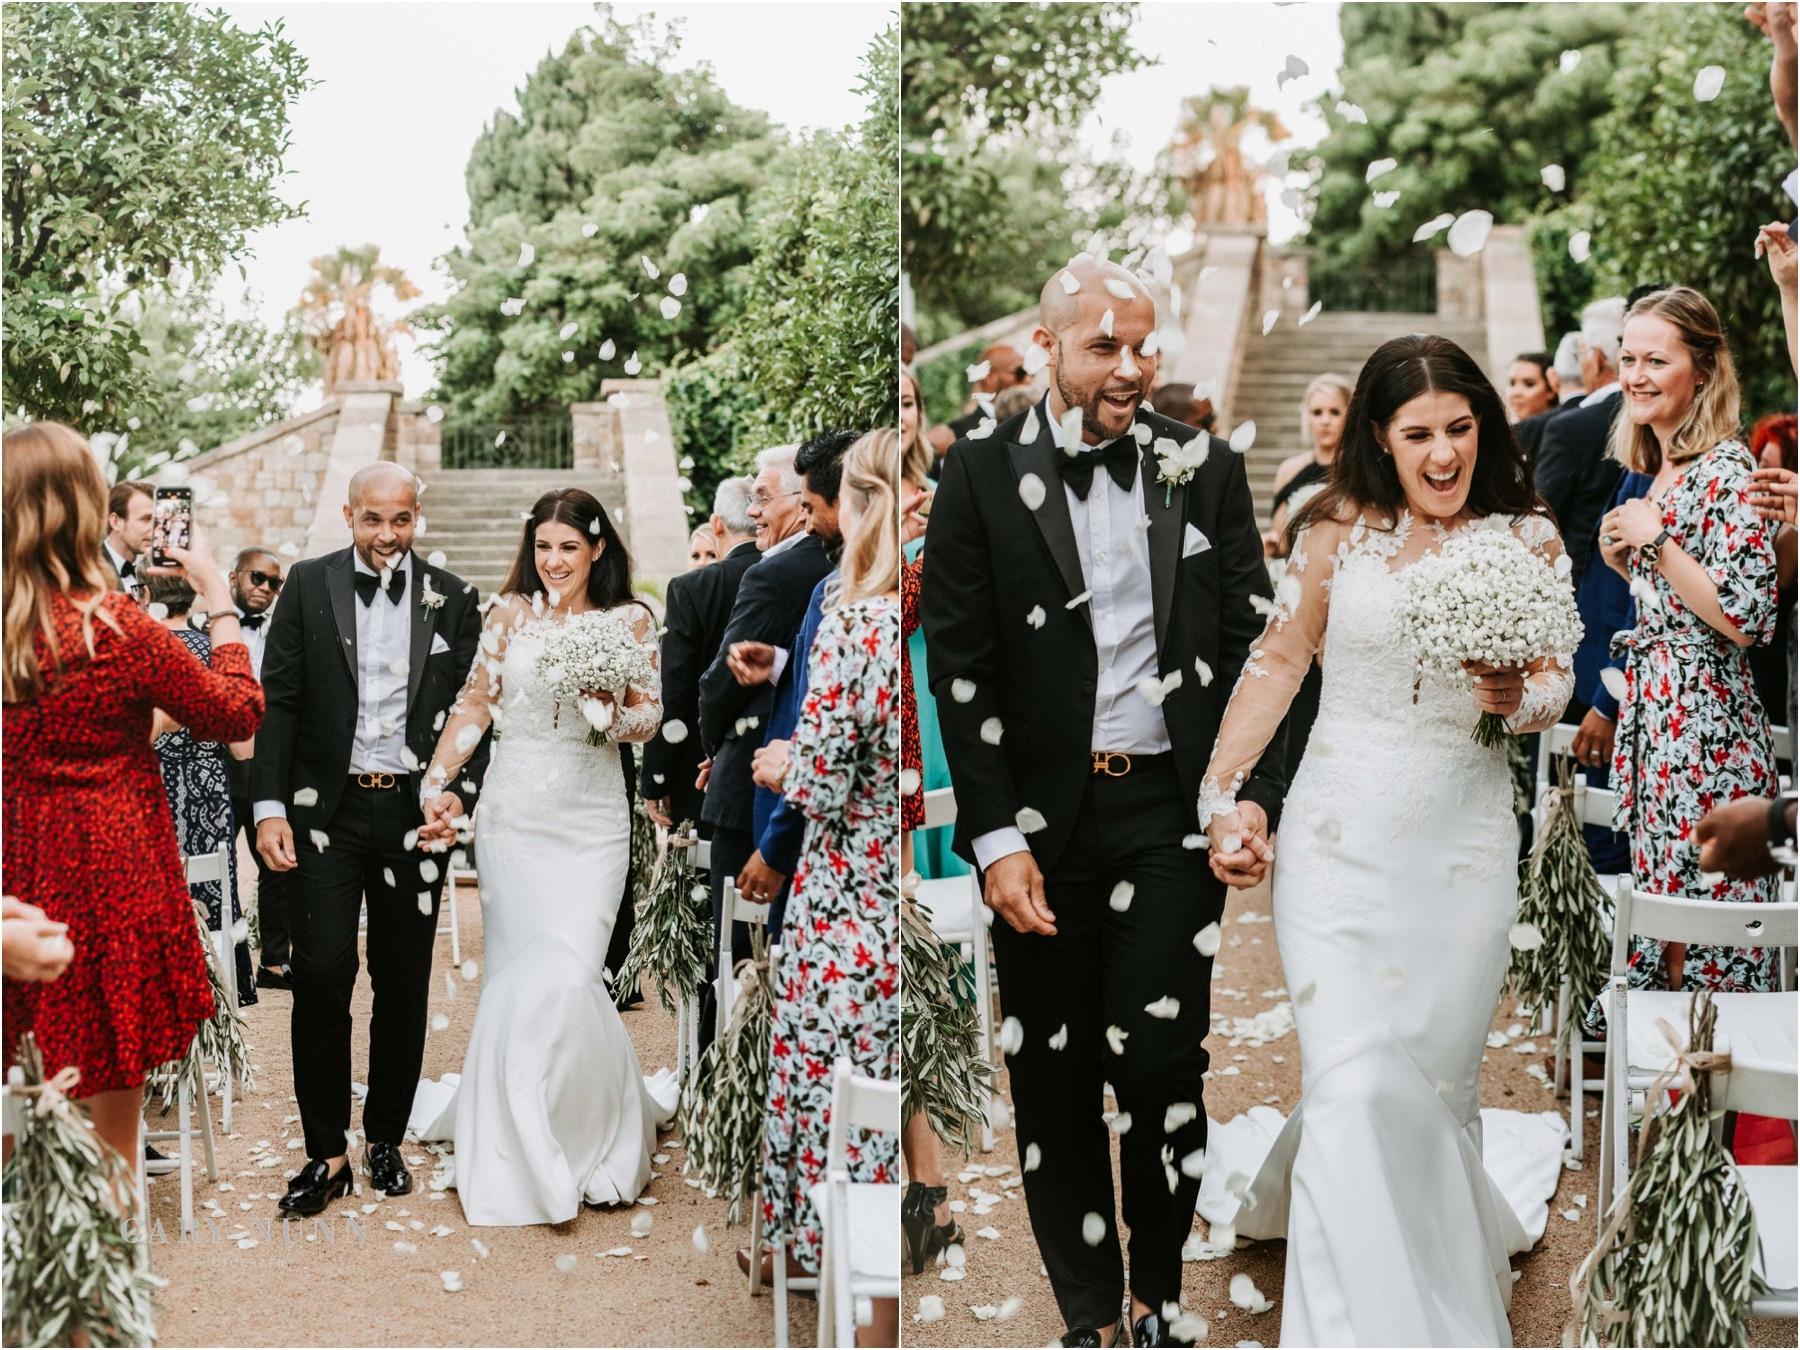 uk destination wedding photographer, best wedding photographer in the uk, best wedding tips